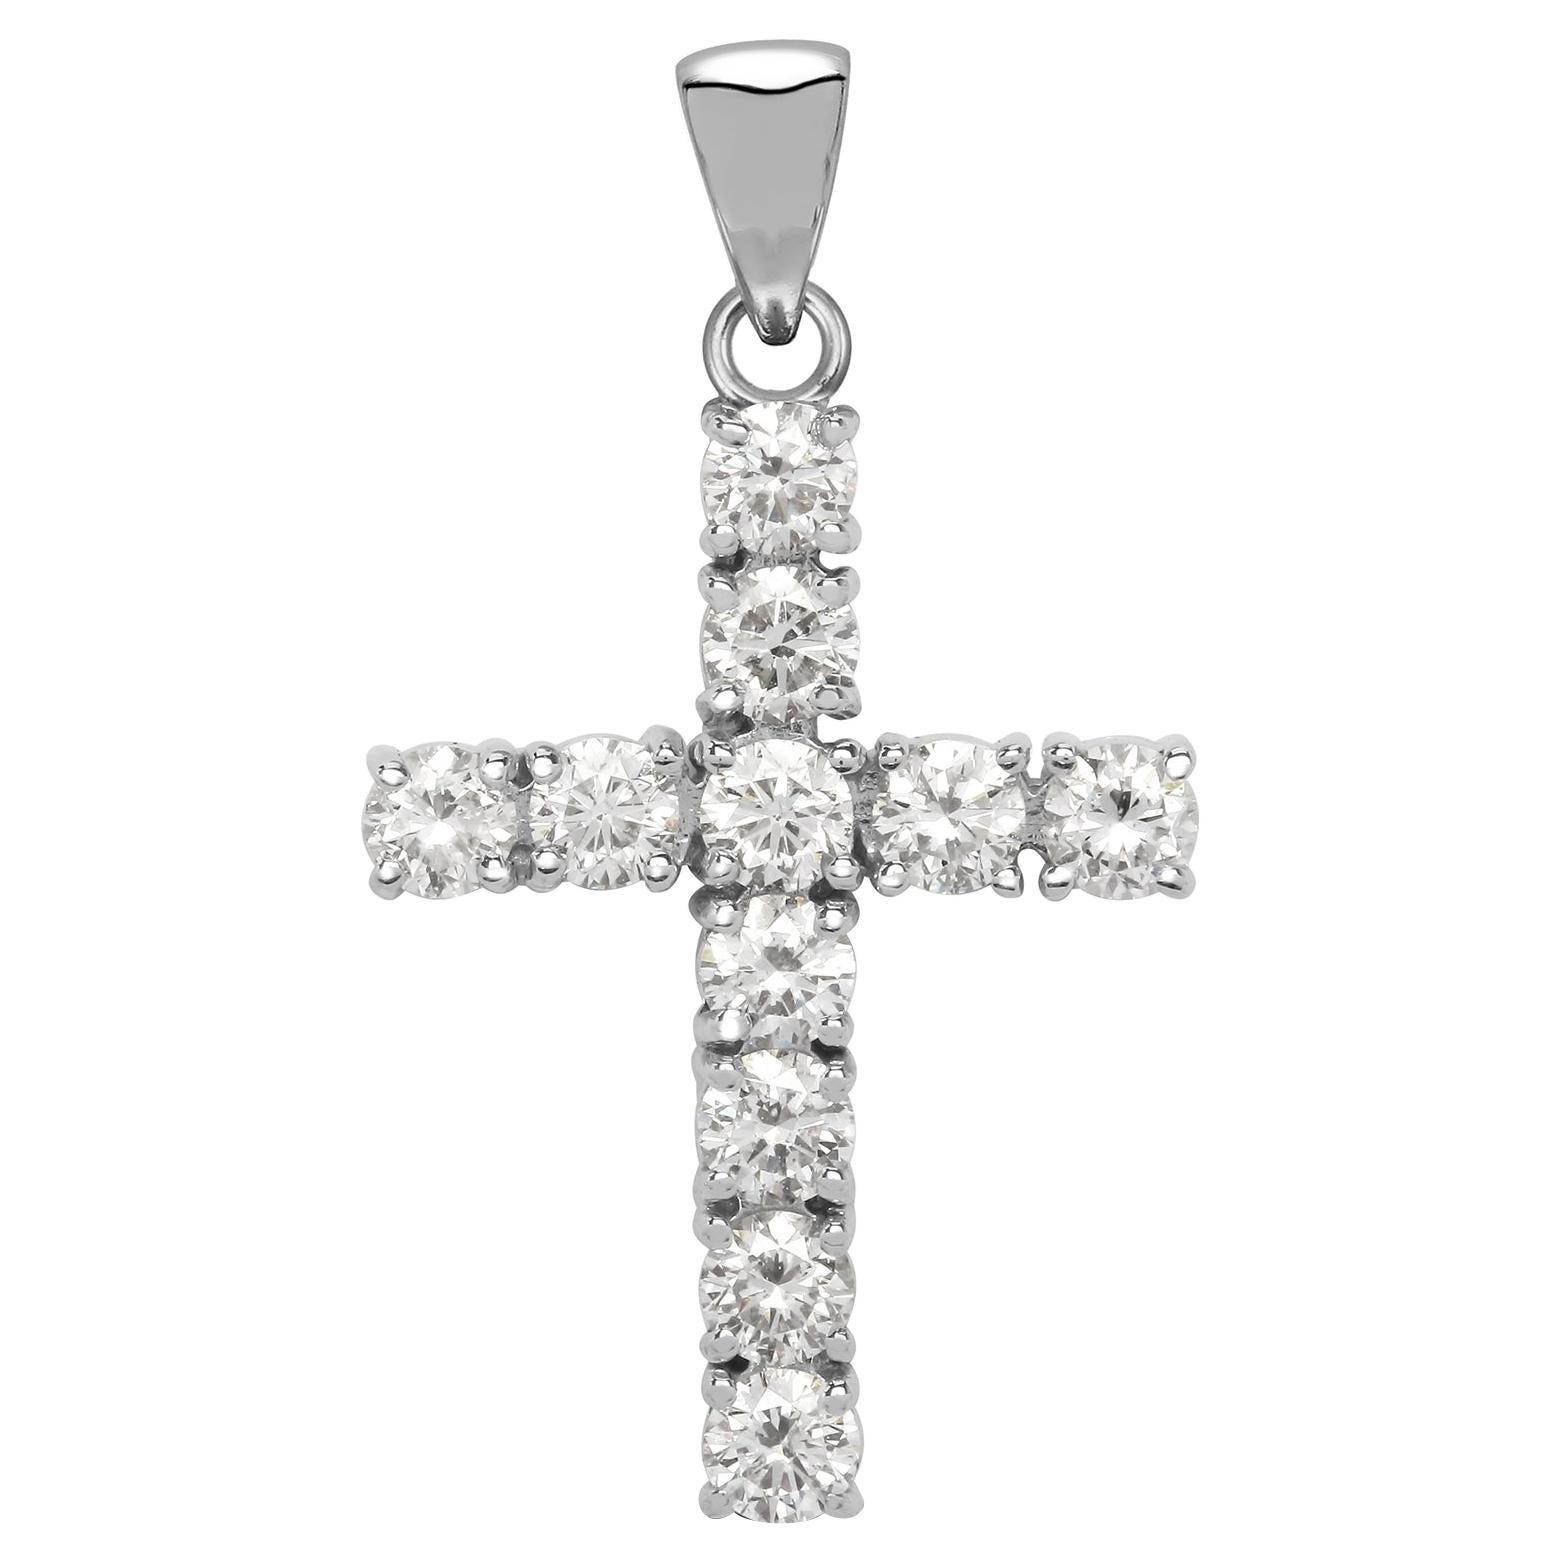 1 Carat Round Brilliant Cut Diamond 18 Karat White Gold Classic Cross Pendant